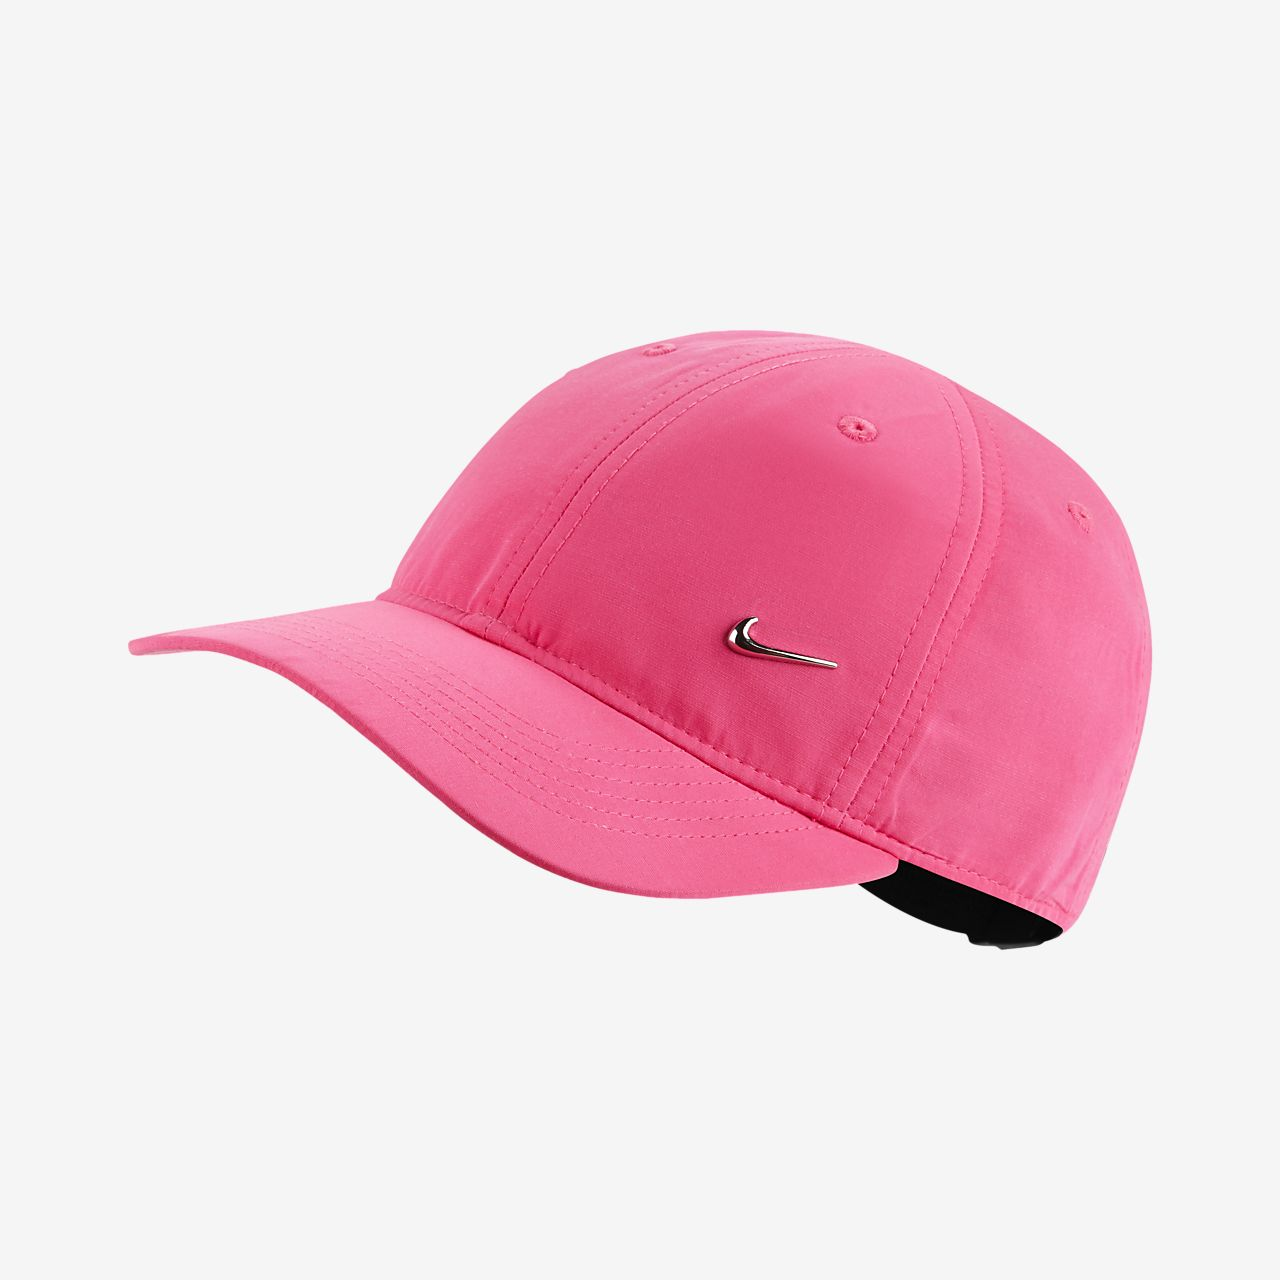 ec0f6b15870 Nike H86 Metal Swoosh Younger Kids  Adjustable Hat. Nike.com GB